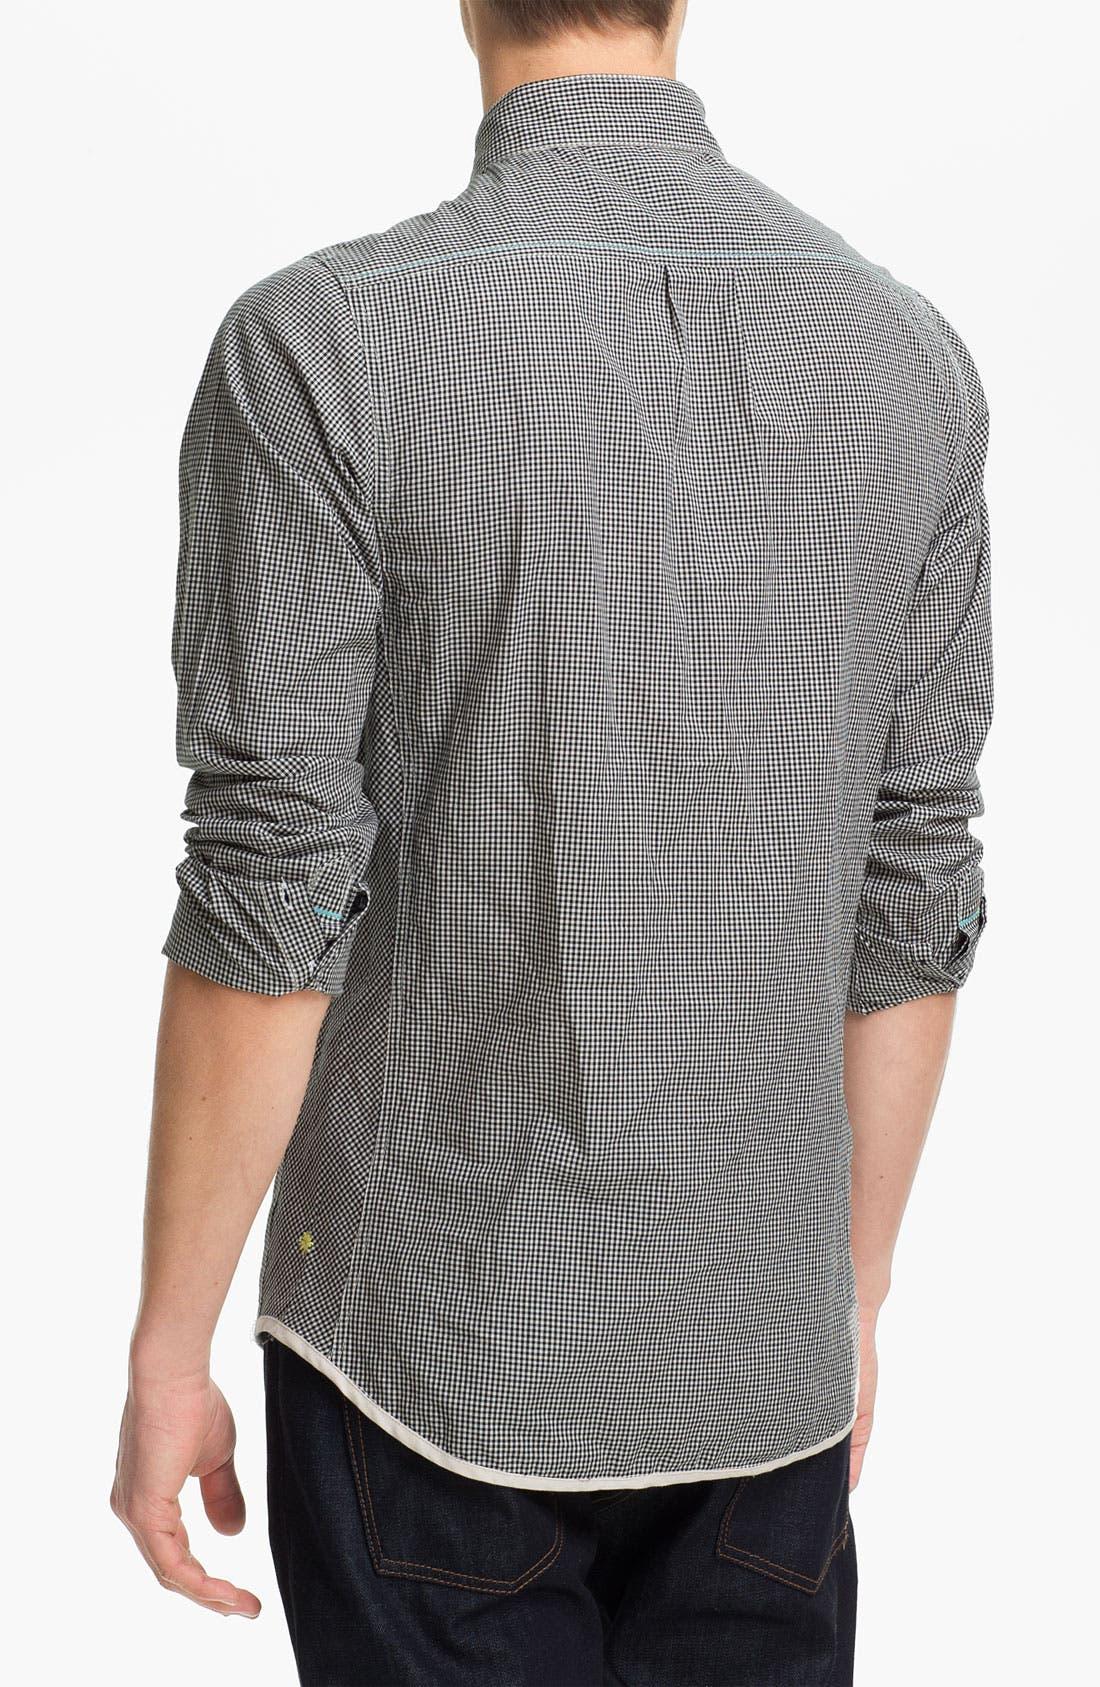 Alternate Image 2  - Descendant of Thieves Gingham Woven Shirt